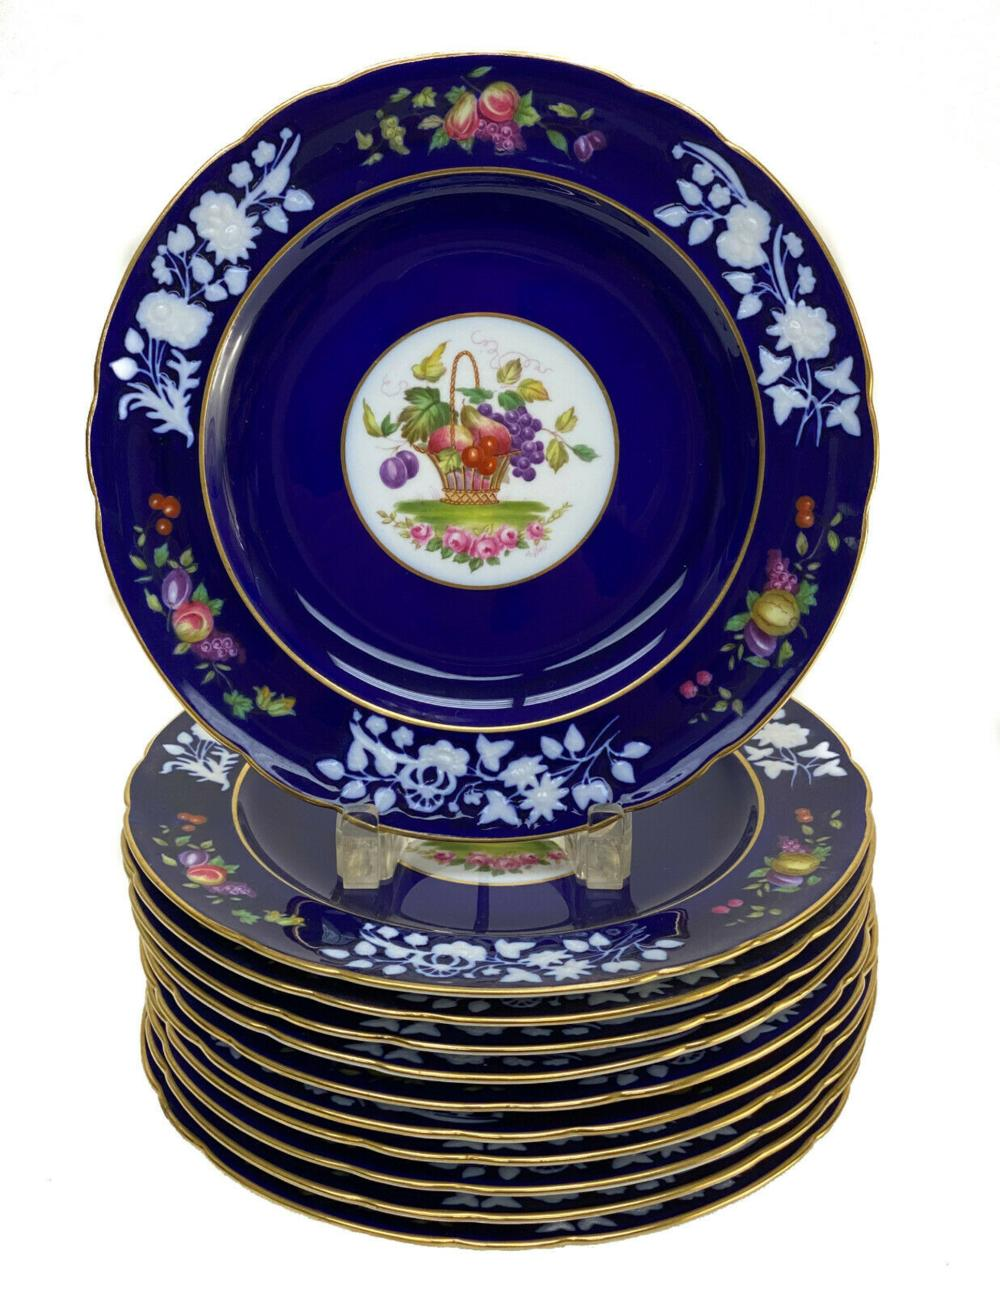 10 Copeland Spode Cobalt Blue Porcelain Dinner Plates